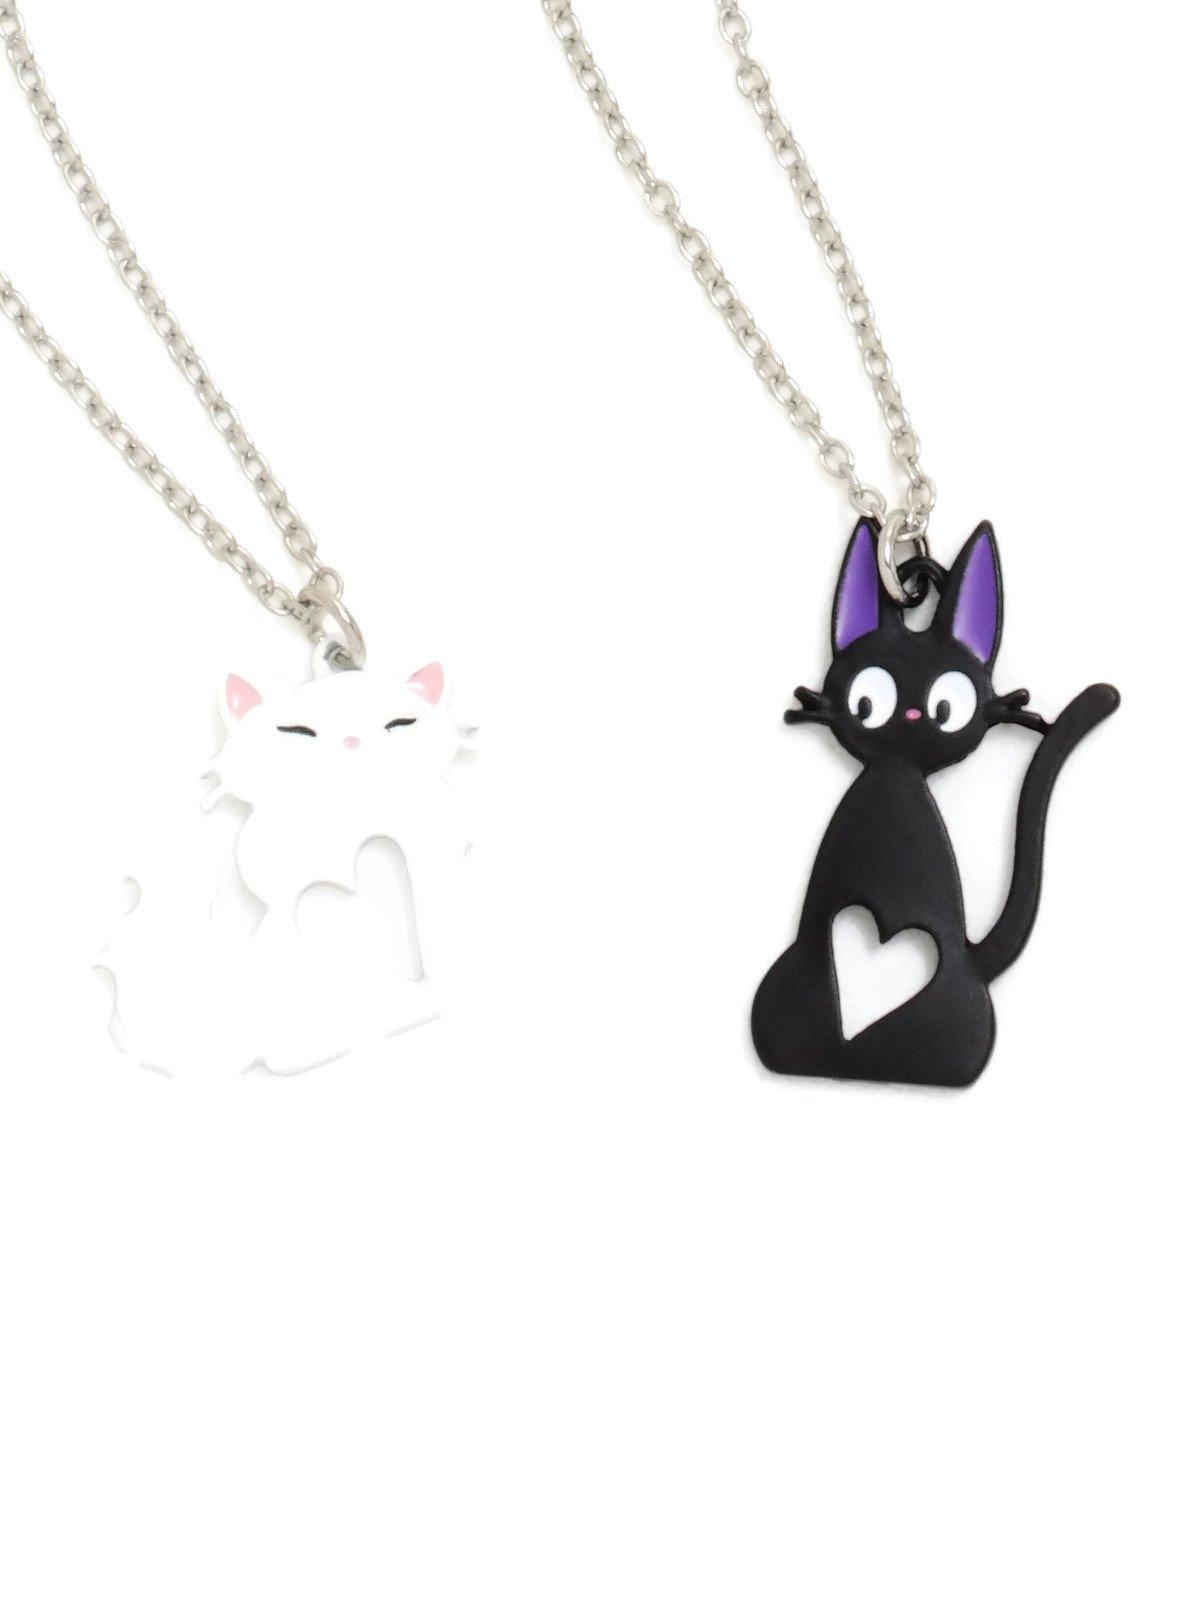 Studio Ghibli Kiki's Delivery Service Jiji & Lily Best Friend Necklace Set